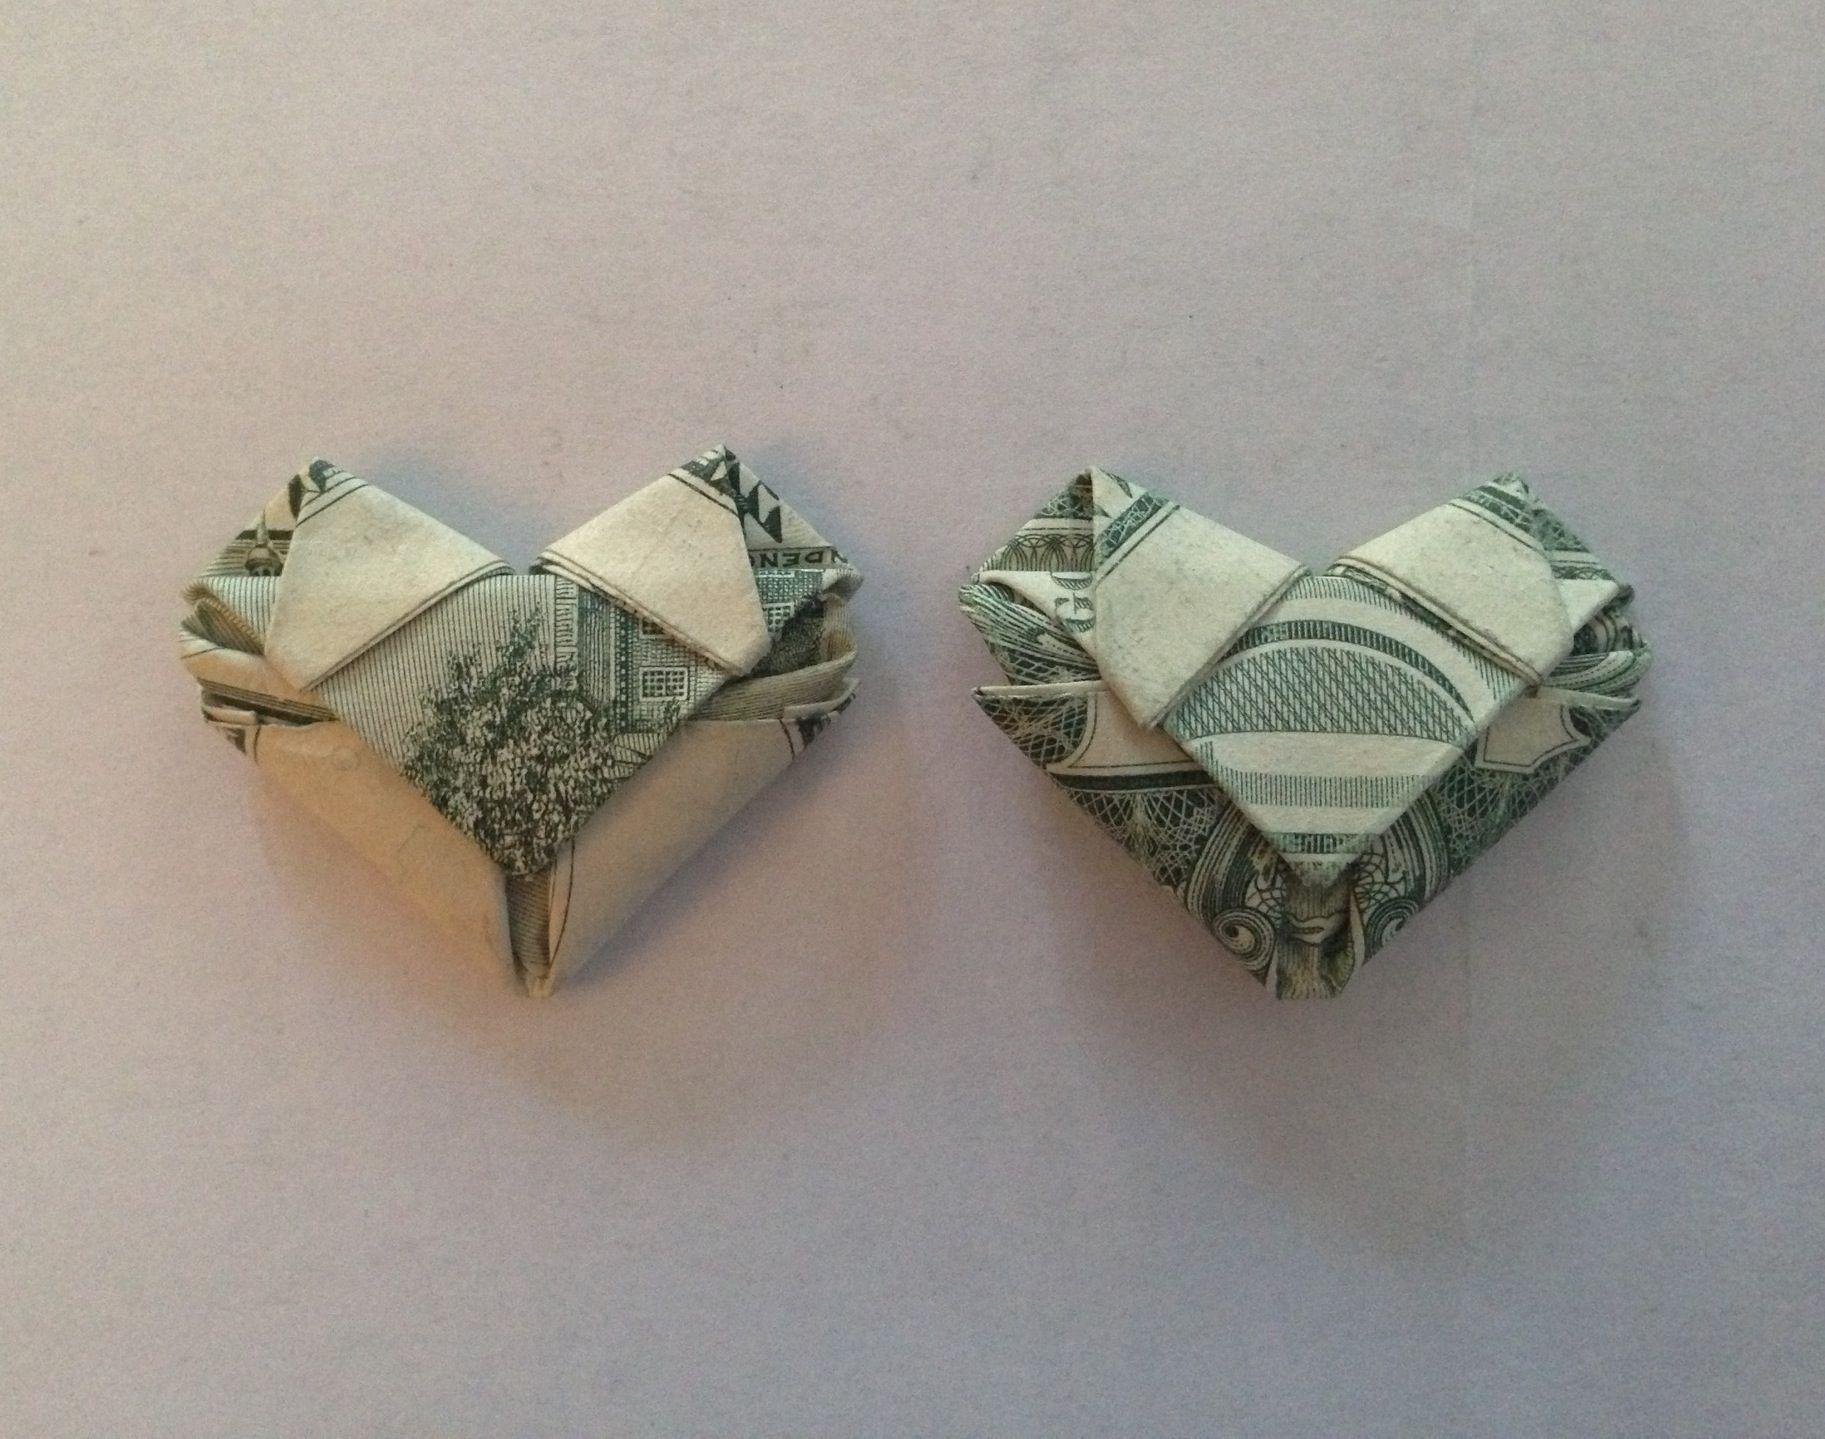 Dollar Bill Origami How To Fold Dollarany Bill Into A Heart Origami Crafts Diy